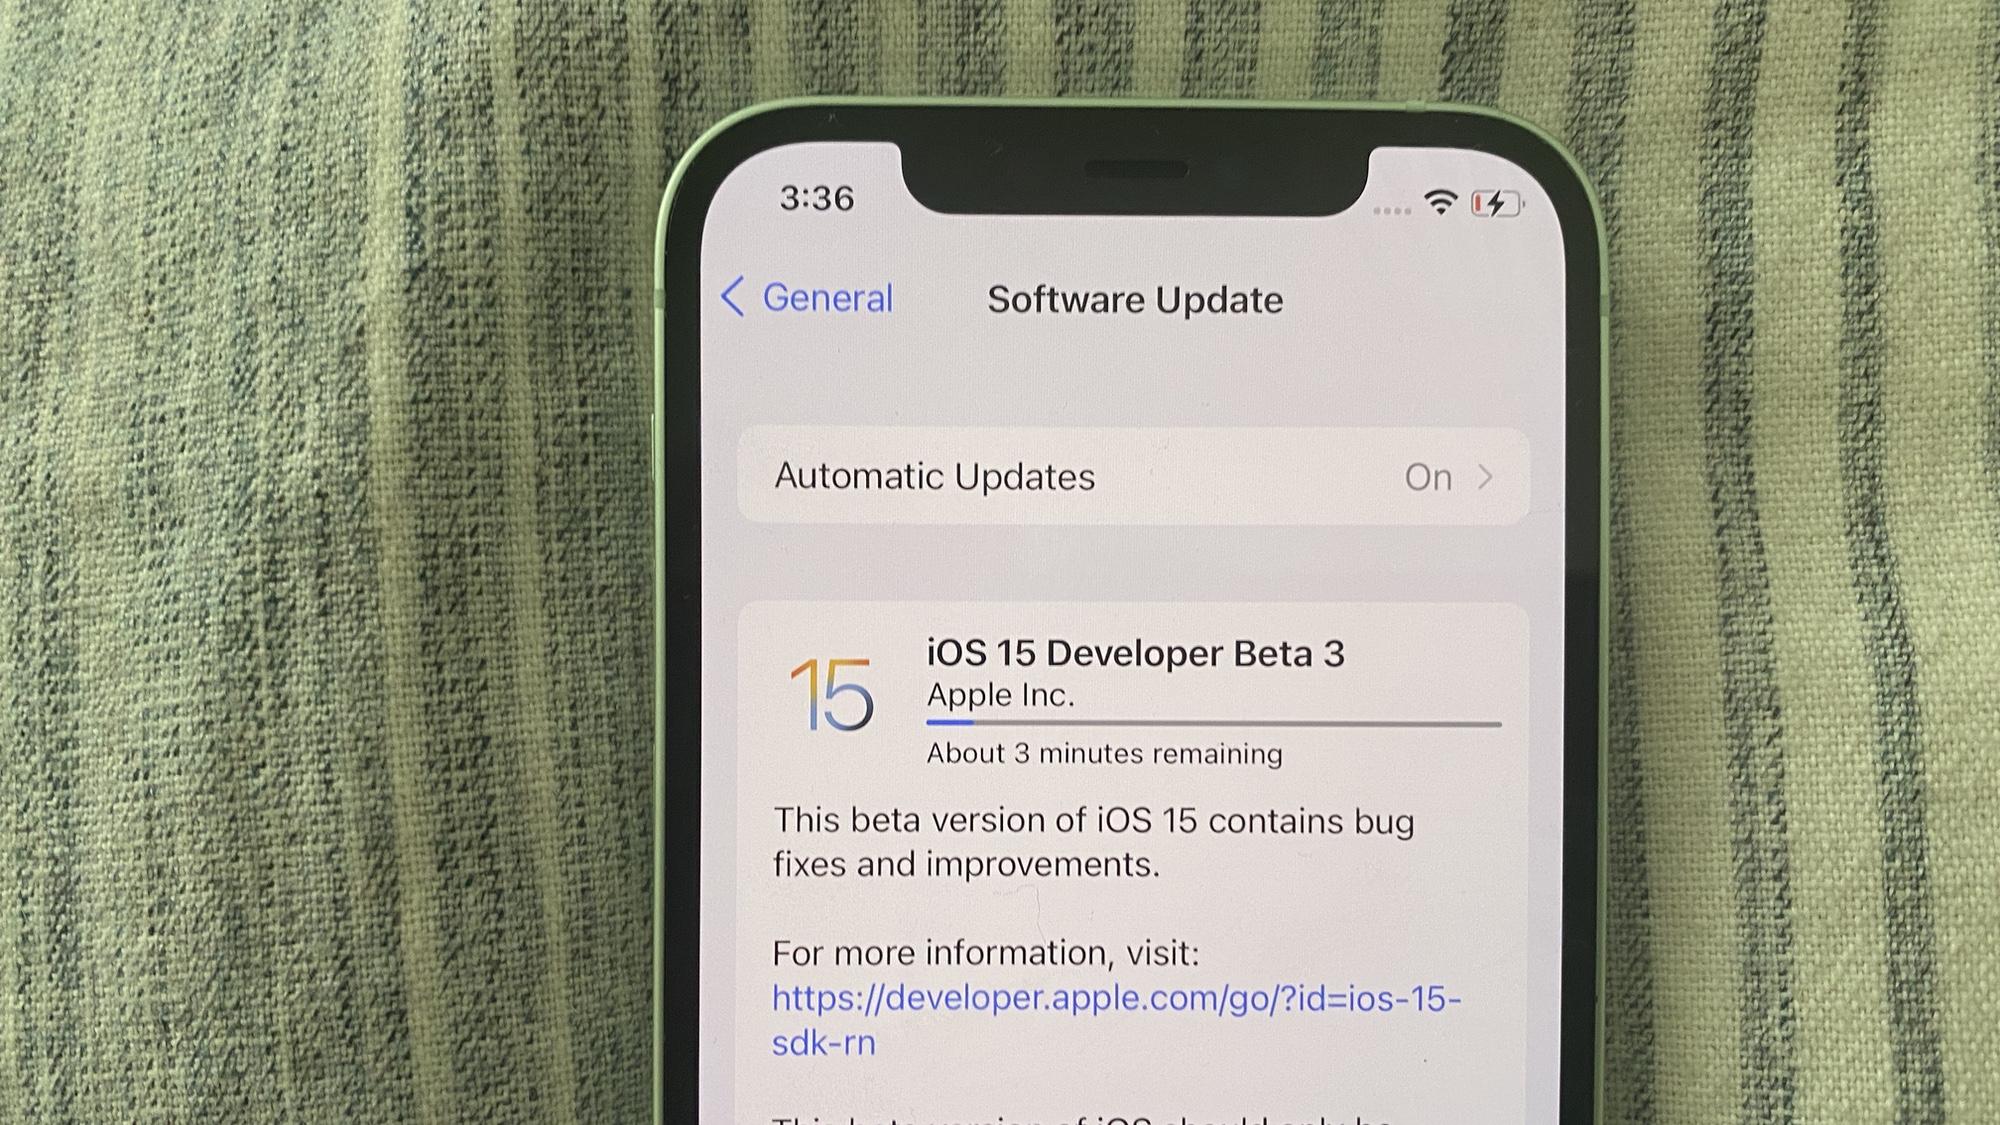 iOS 15 beta 3